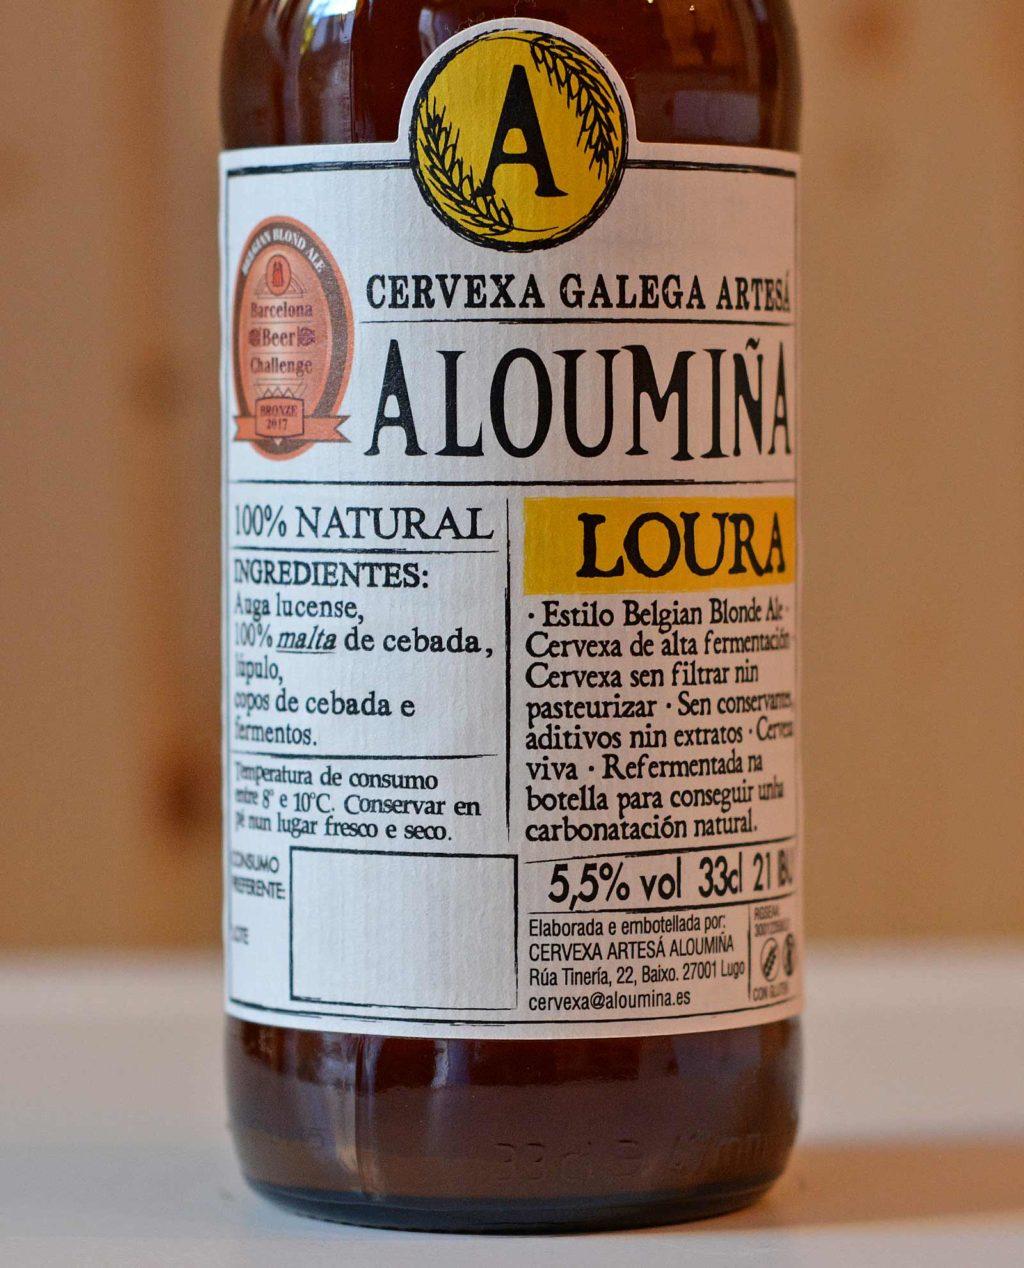 aloumina-cerveza-artesana-craft-beer-lugo-galicia-loura-bbc-barcelonabeerchallenge-belgianblondeale-b